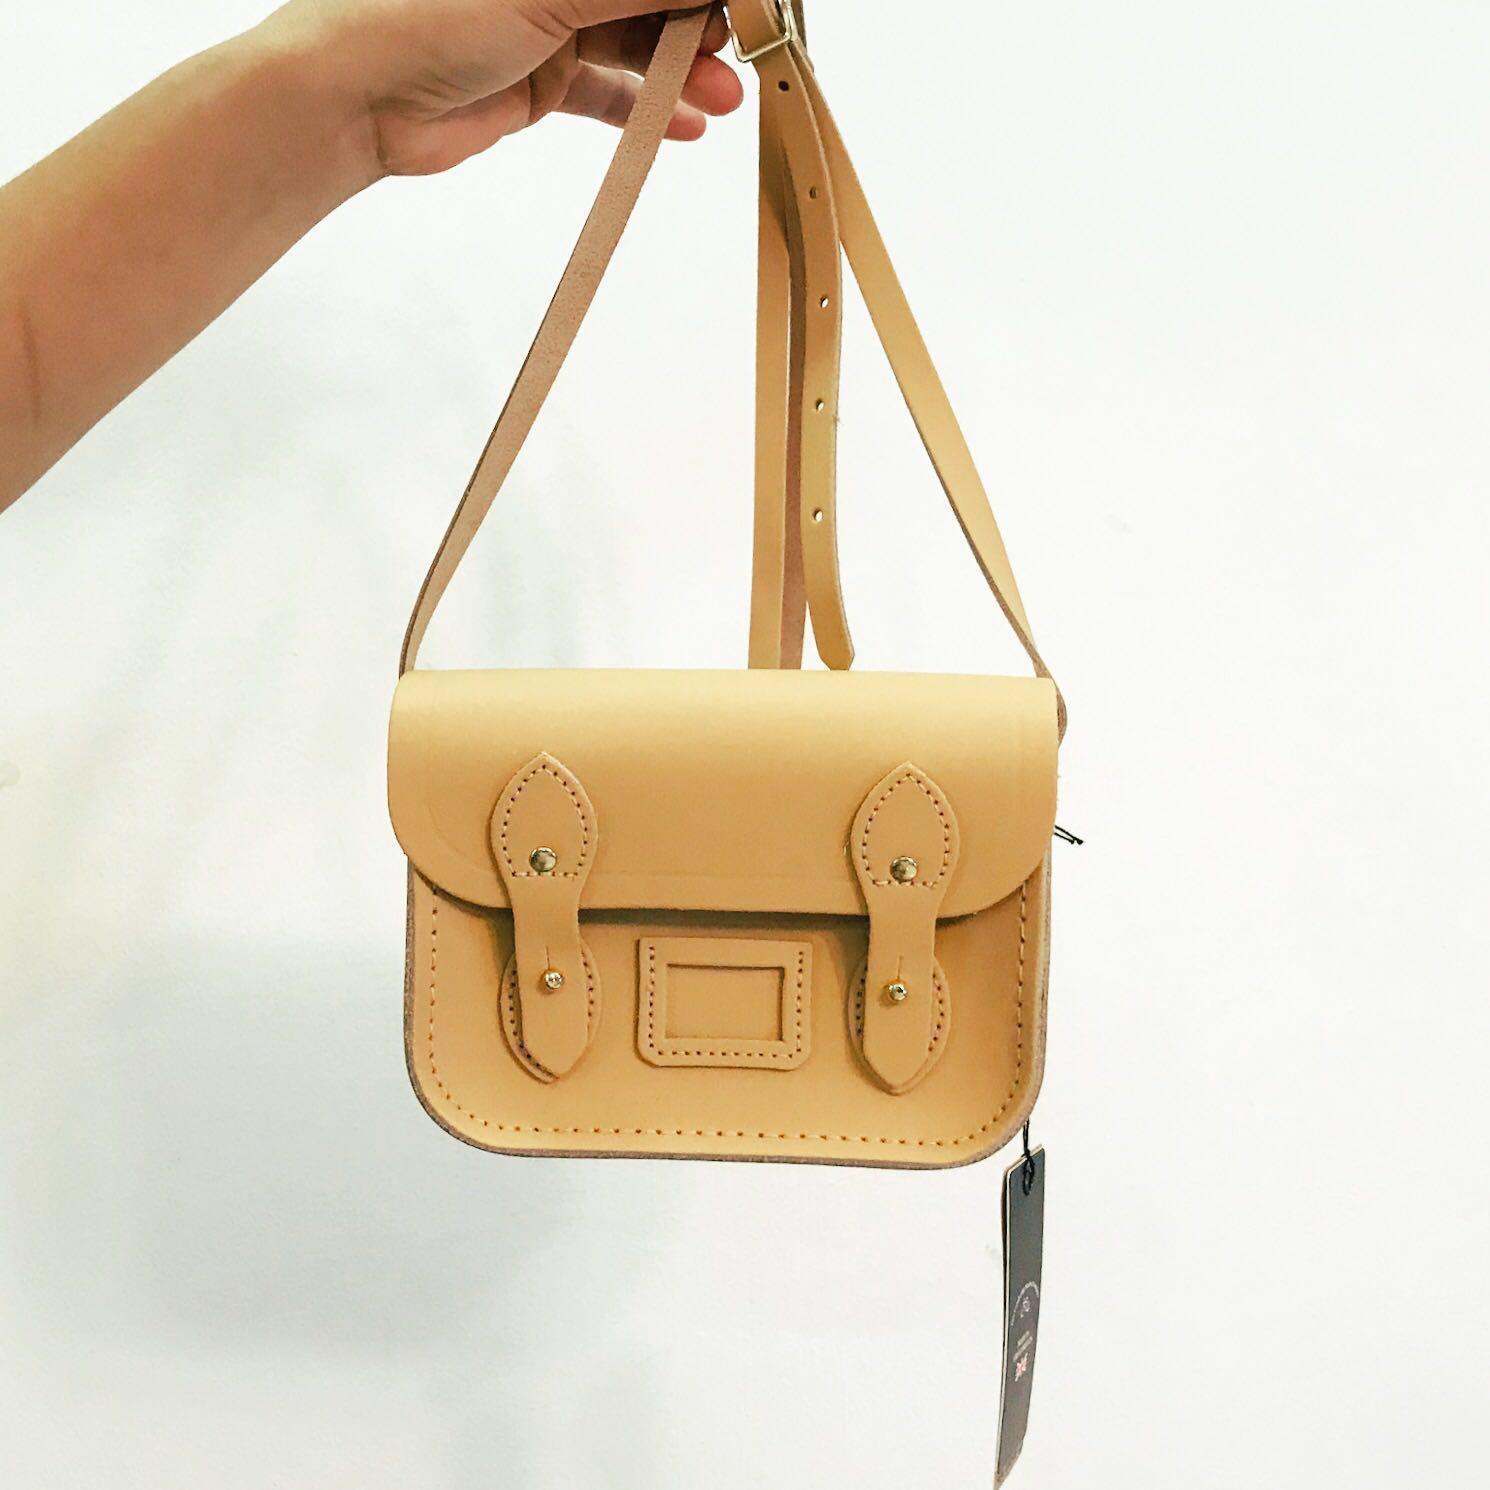 Cambridge Satchel Leather Tiny Satchel in Safari Sand - Brand New ... e266a3ec6155c